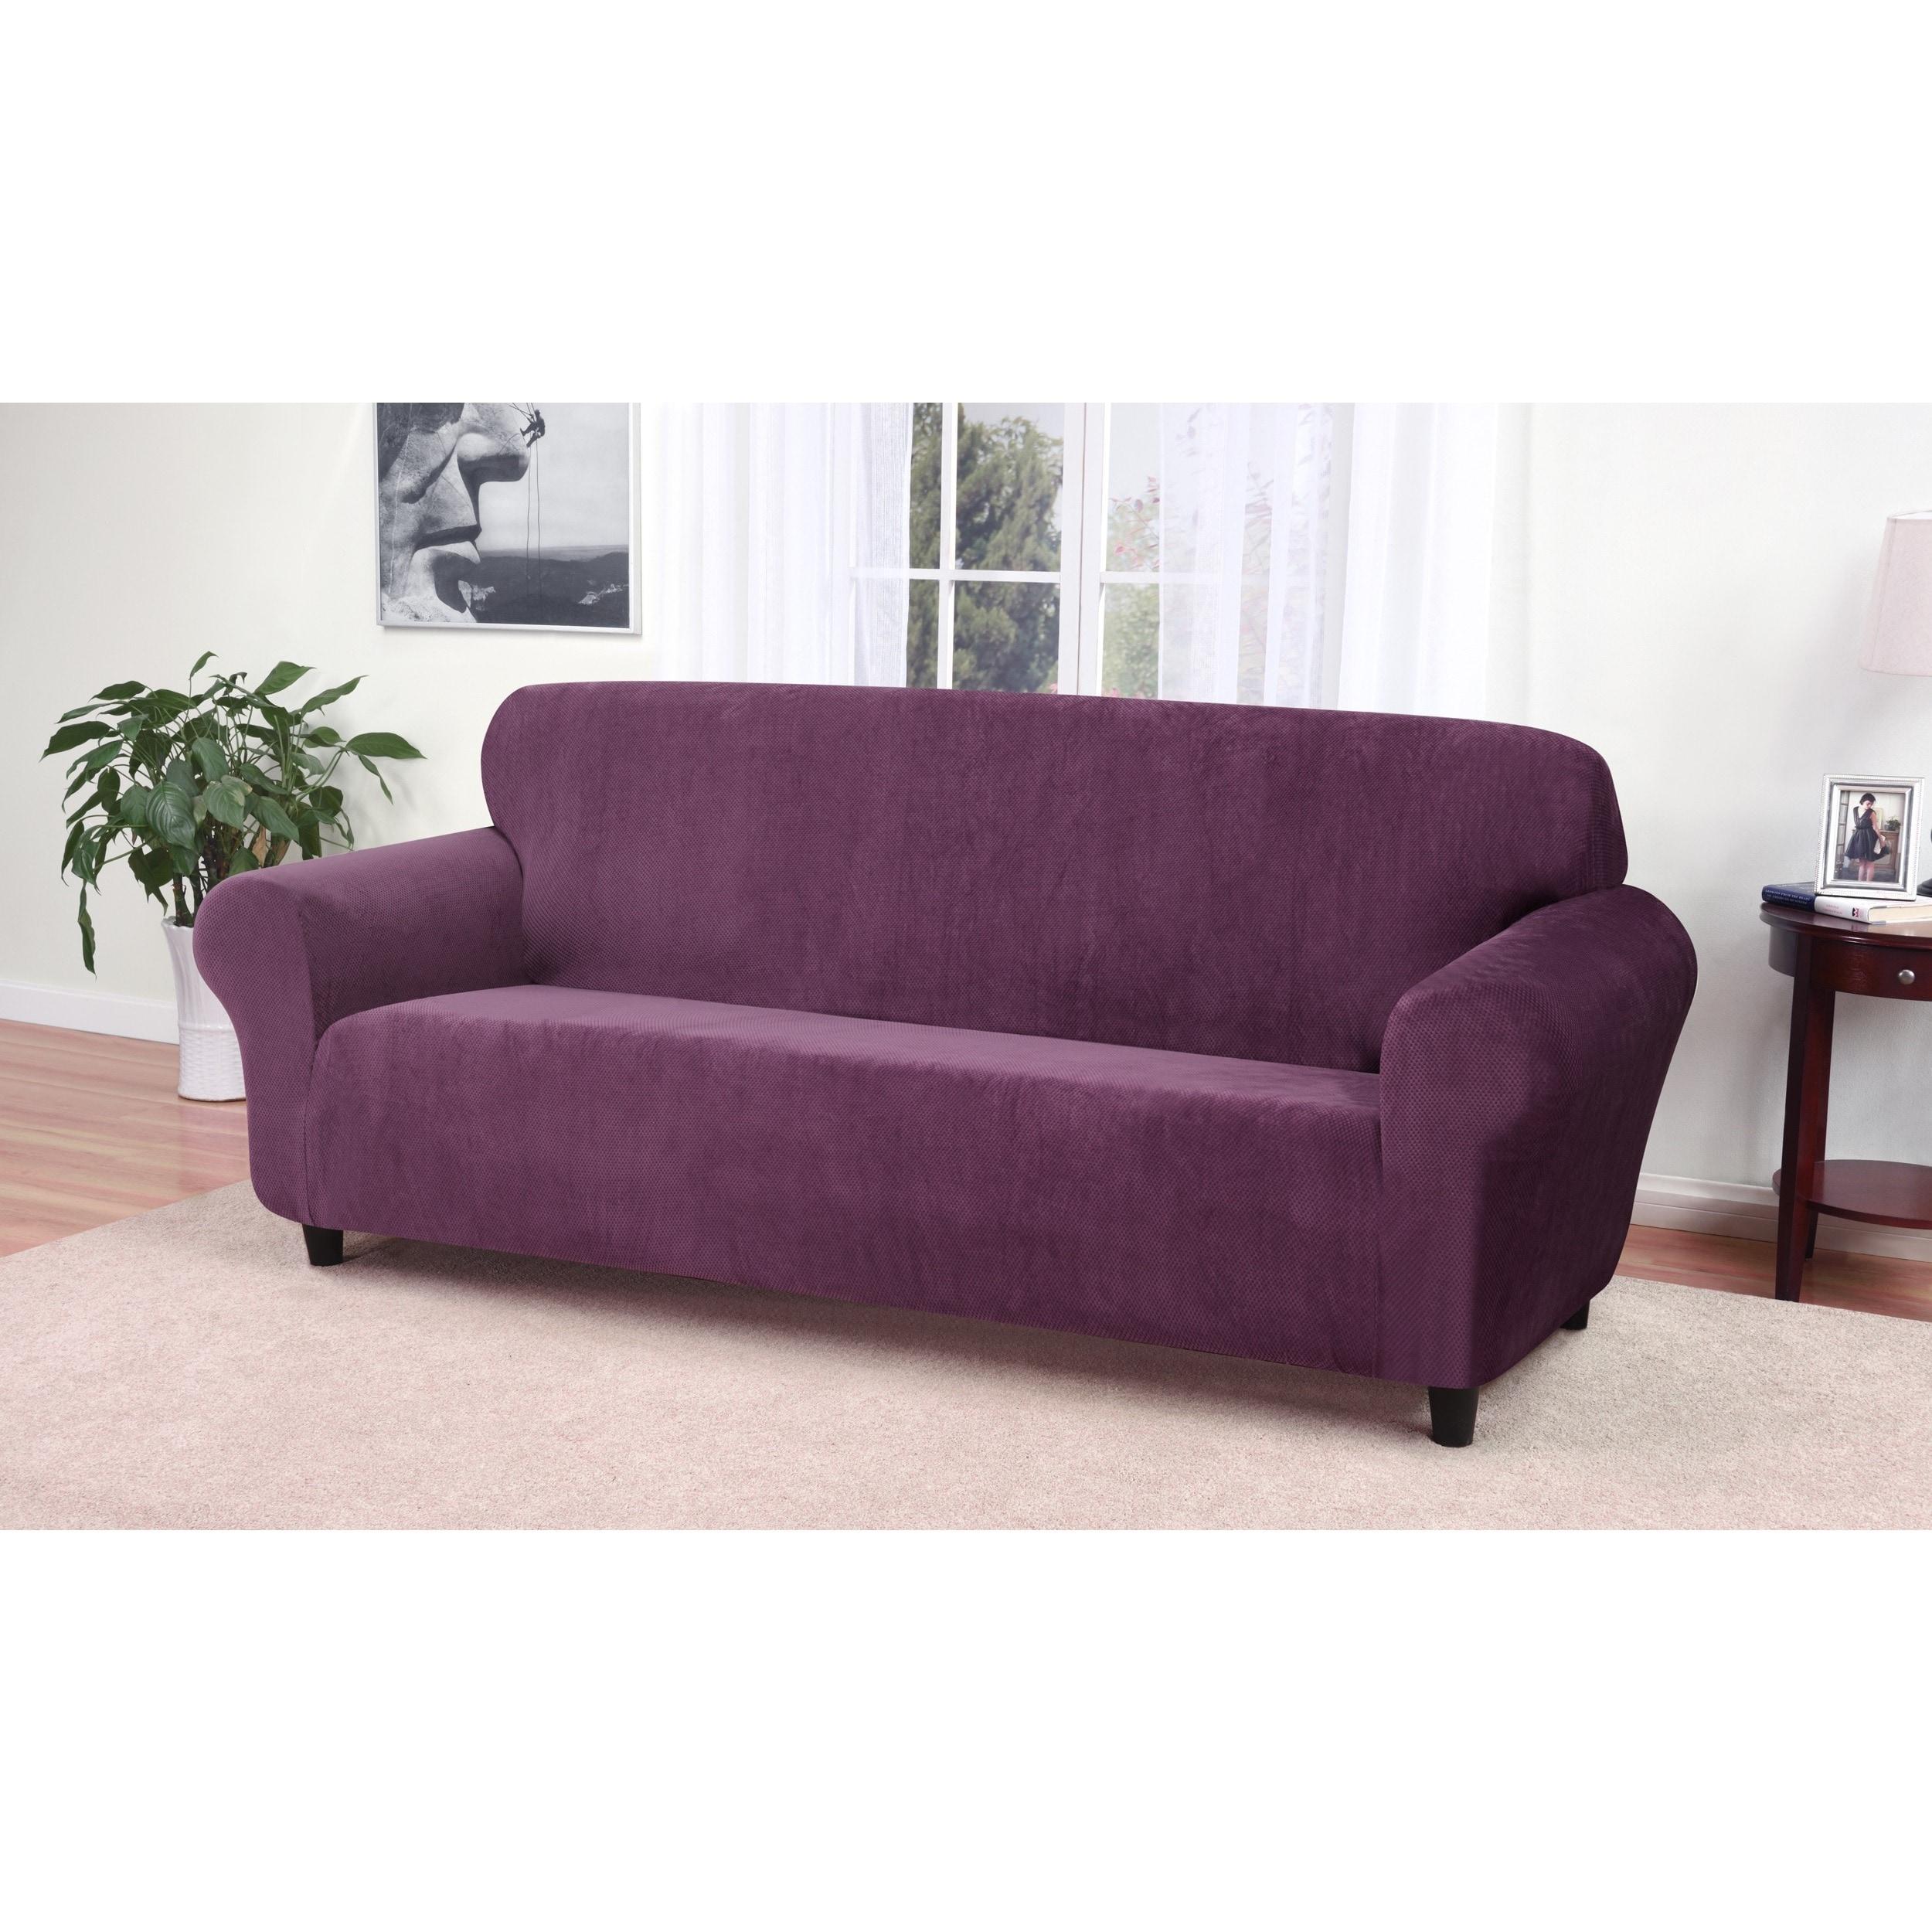 Superb Kathy Ireland Day Break Sofa Slipcover   Free Shipping Today   Overstock    20662720